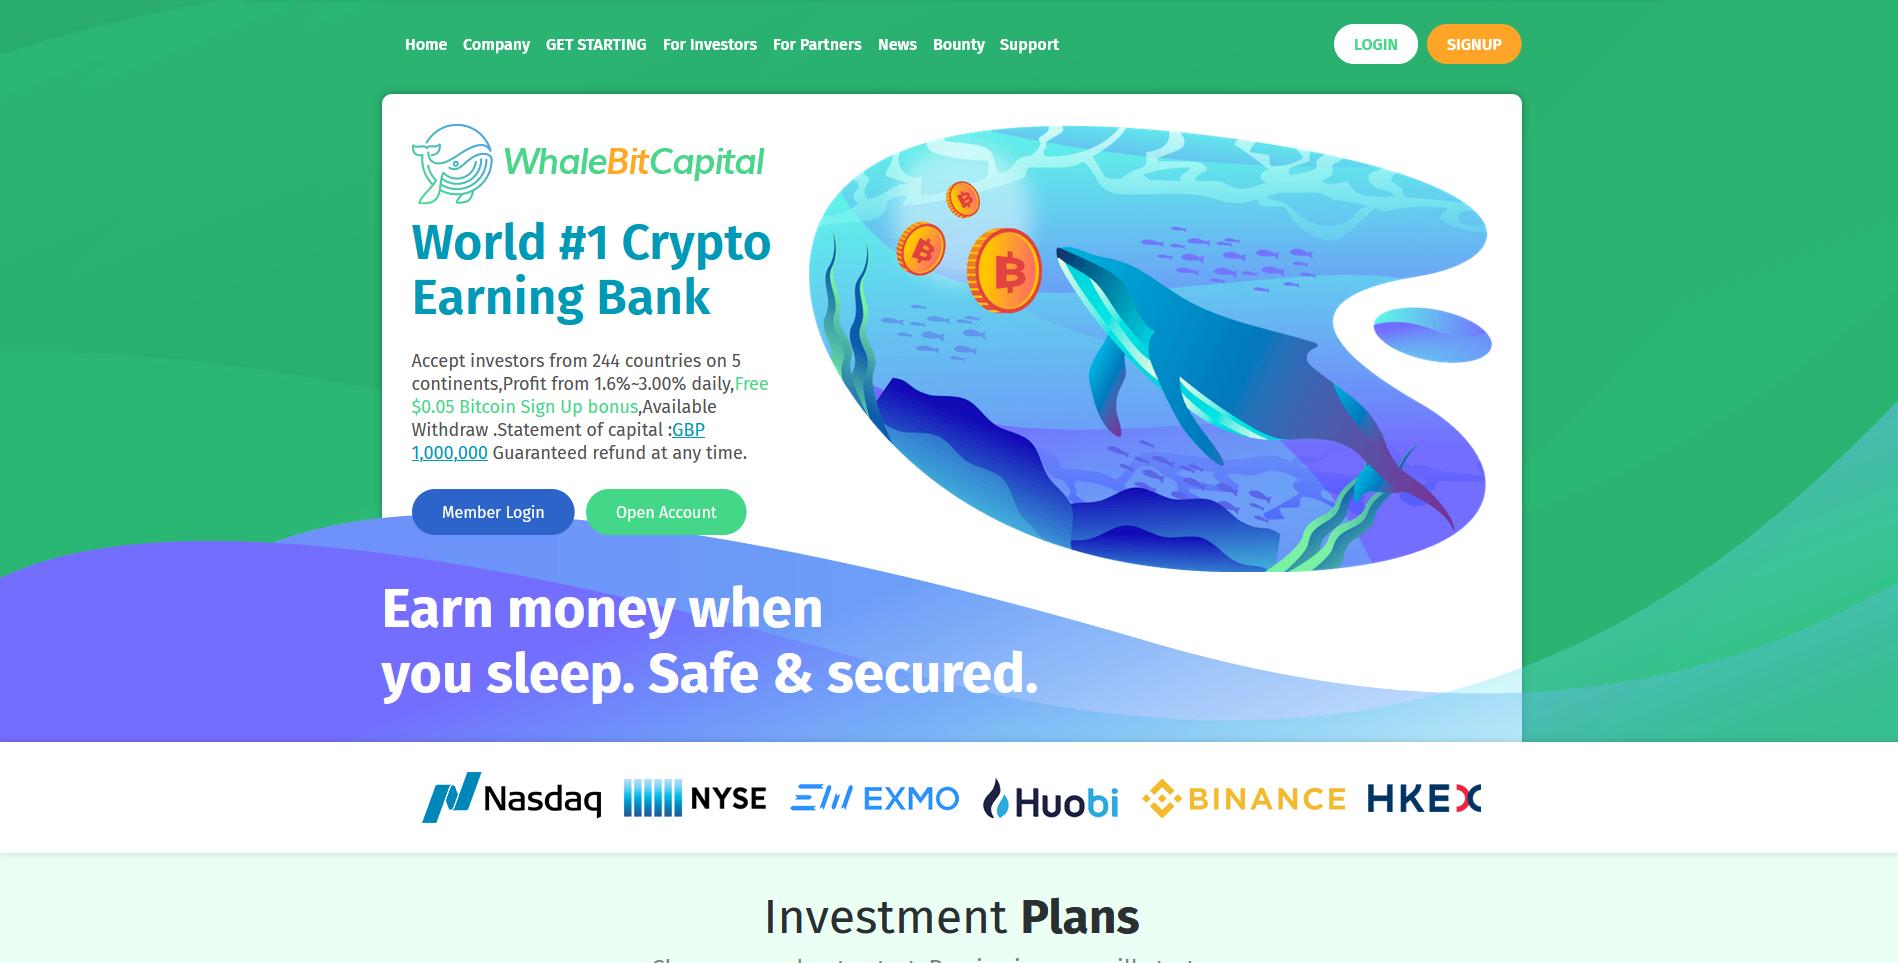 Whale Bit Capital